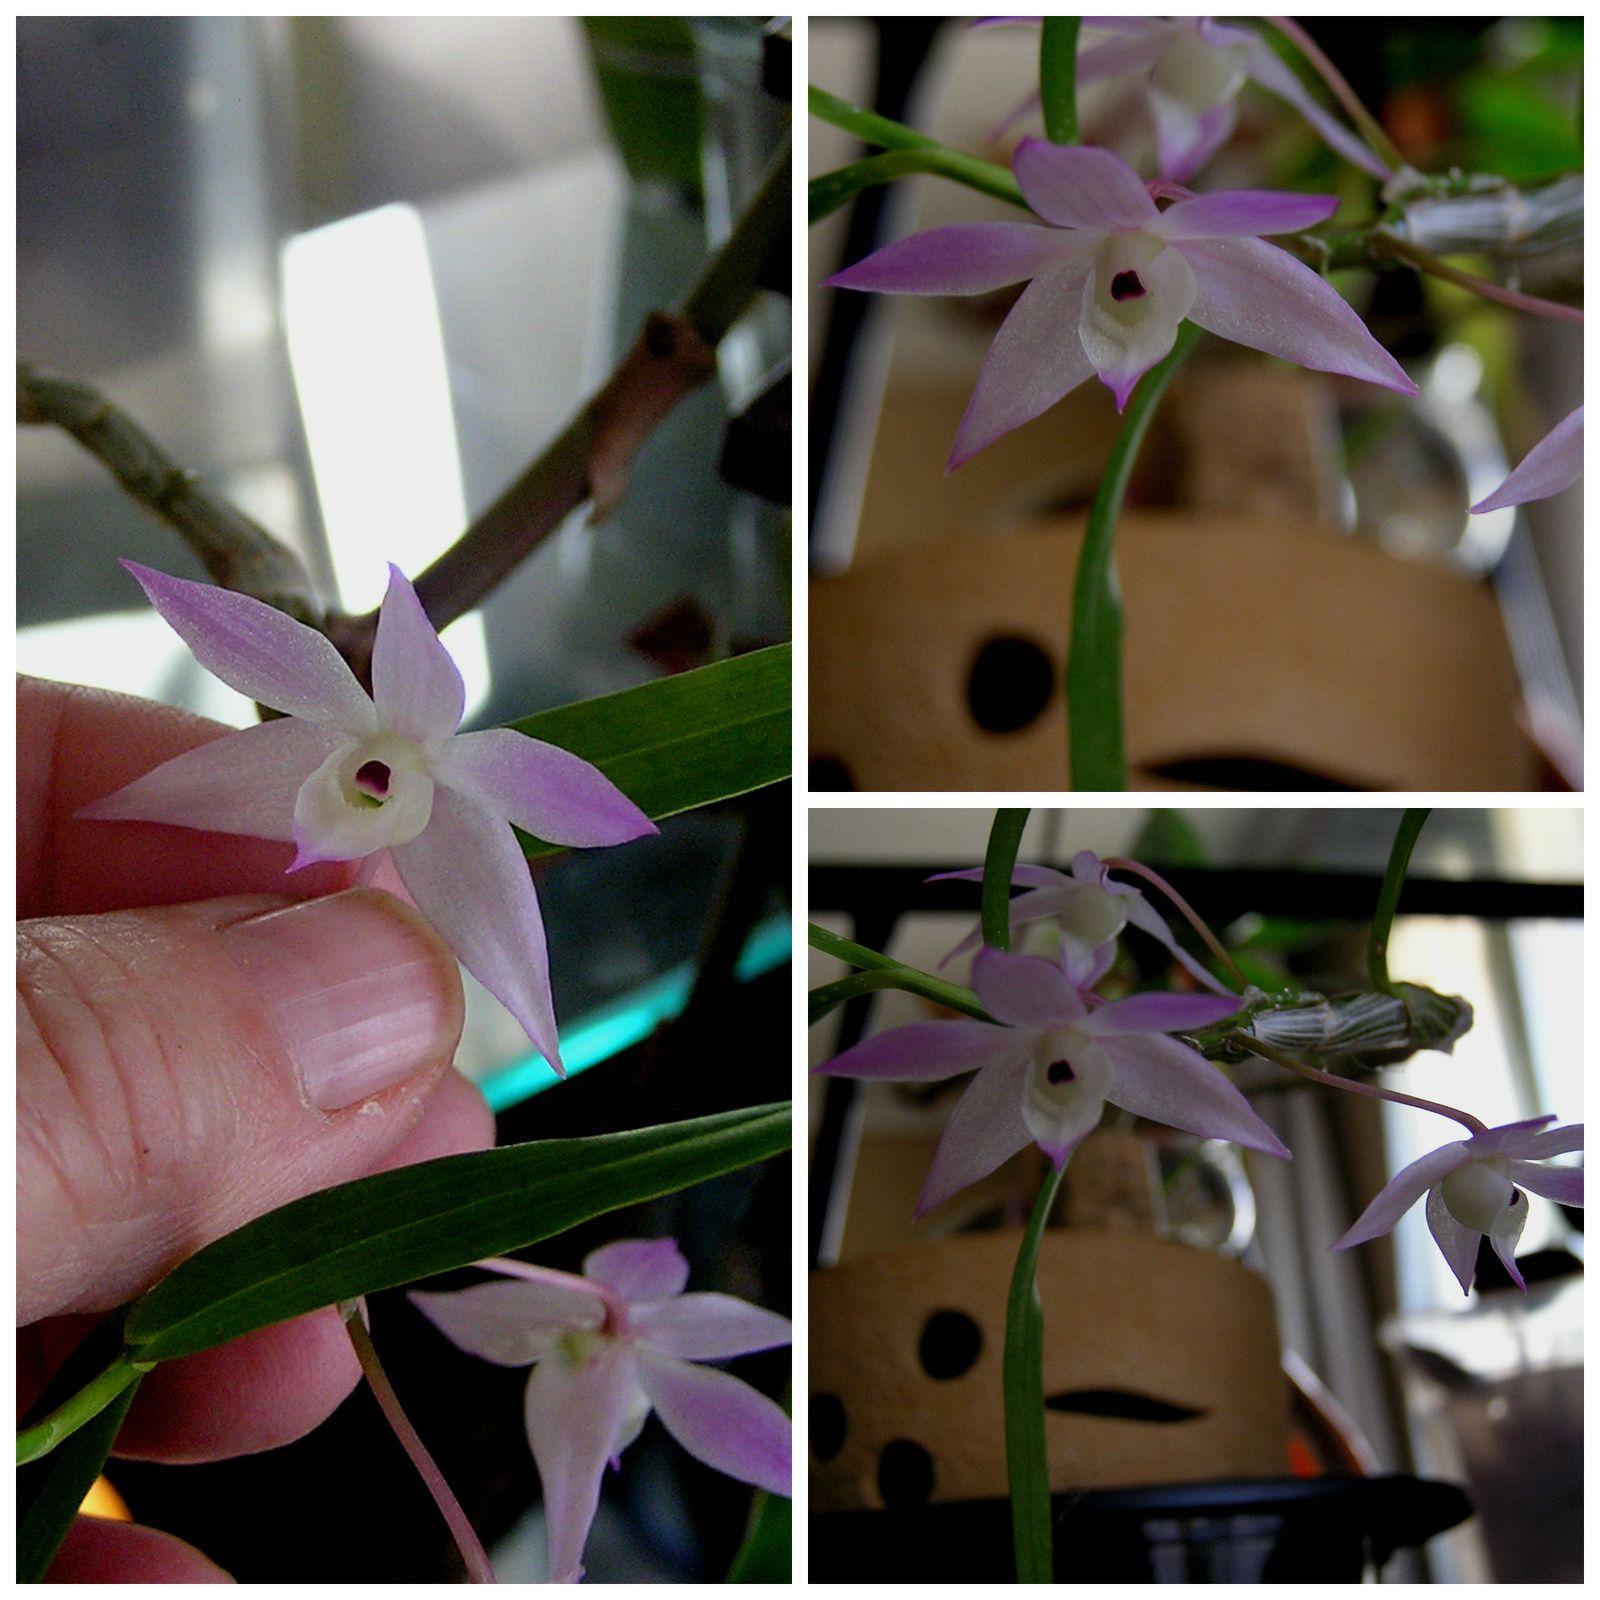 Labelorchidée : Dendrobium hercoglossum